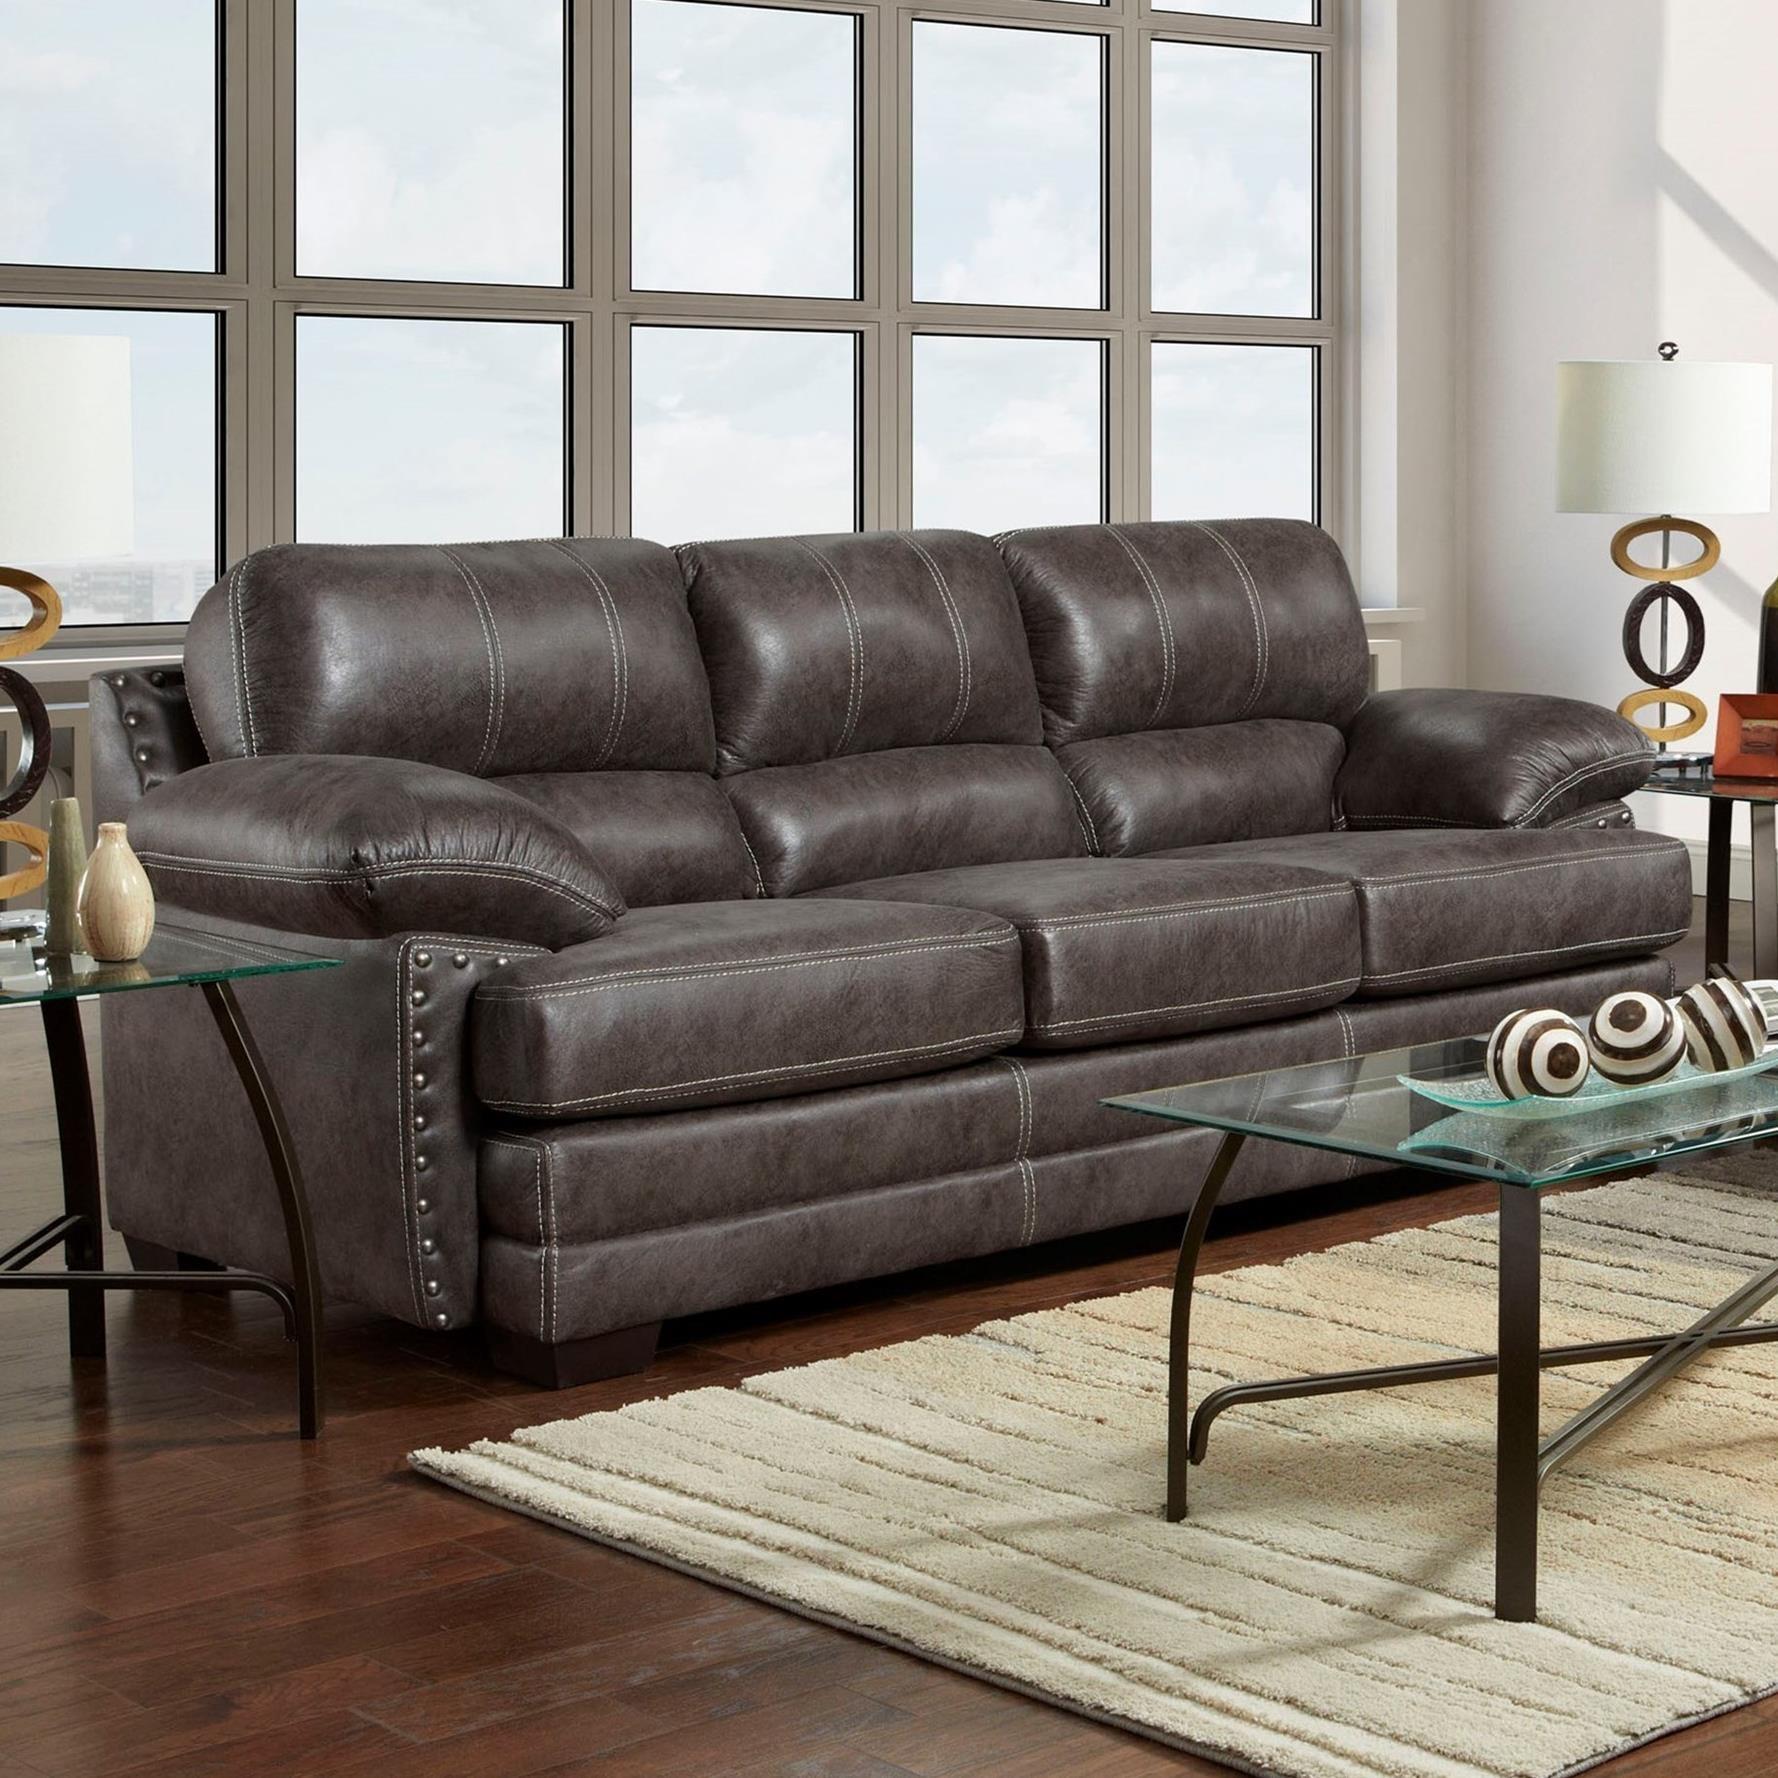 1650 Sofa by Washington Furniture at Lynn's Furniture & Mattress